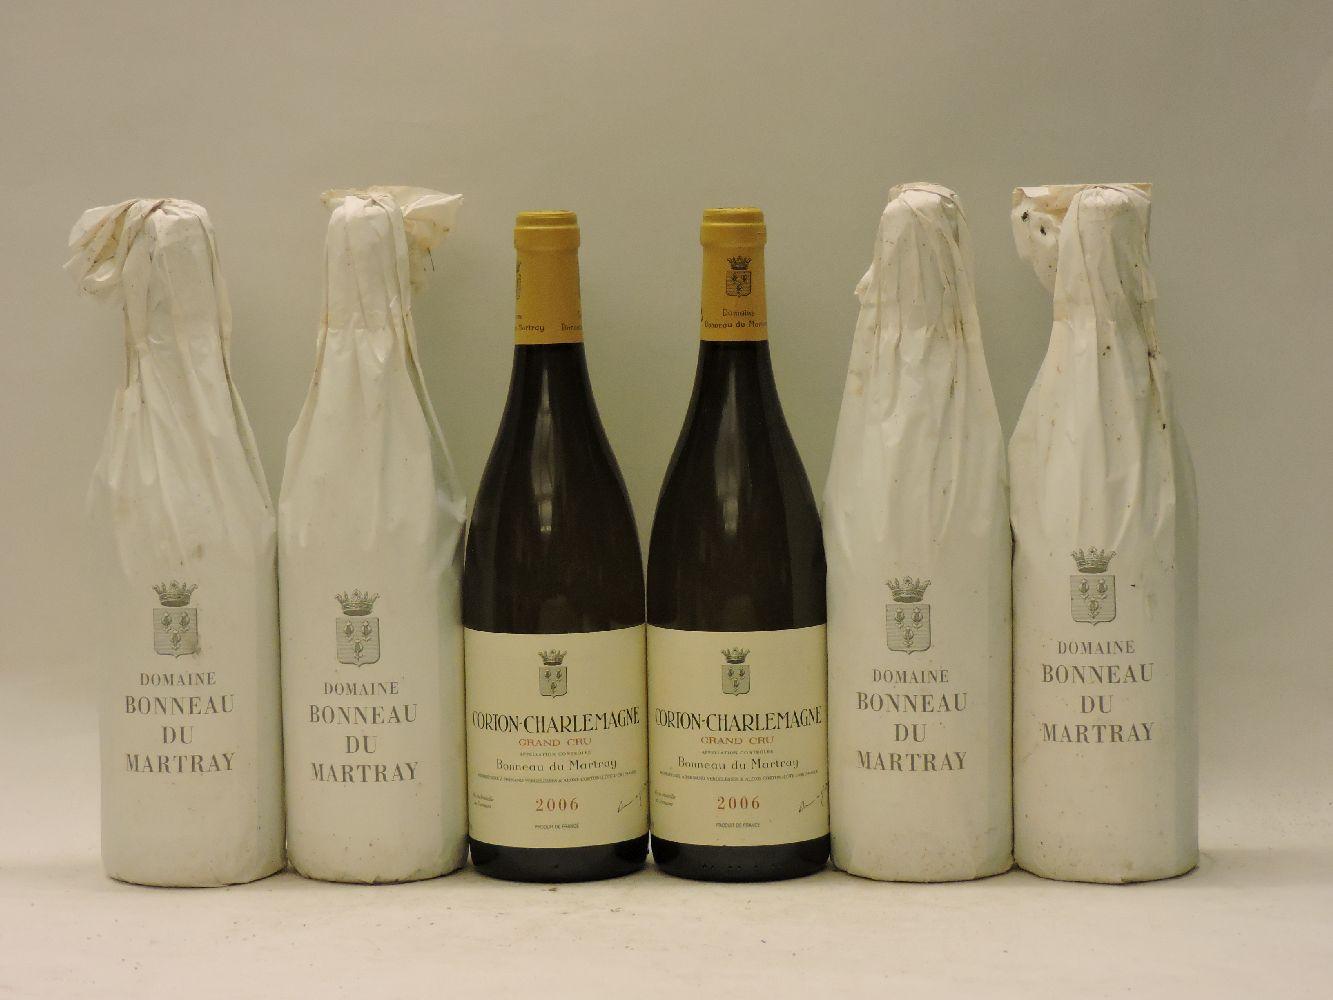 Lot 32 - Corton-Charlemagne Grand Cru, Domaine Bonneau du Martray, 2006, six bottles (owc, originally for